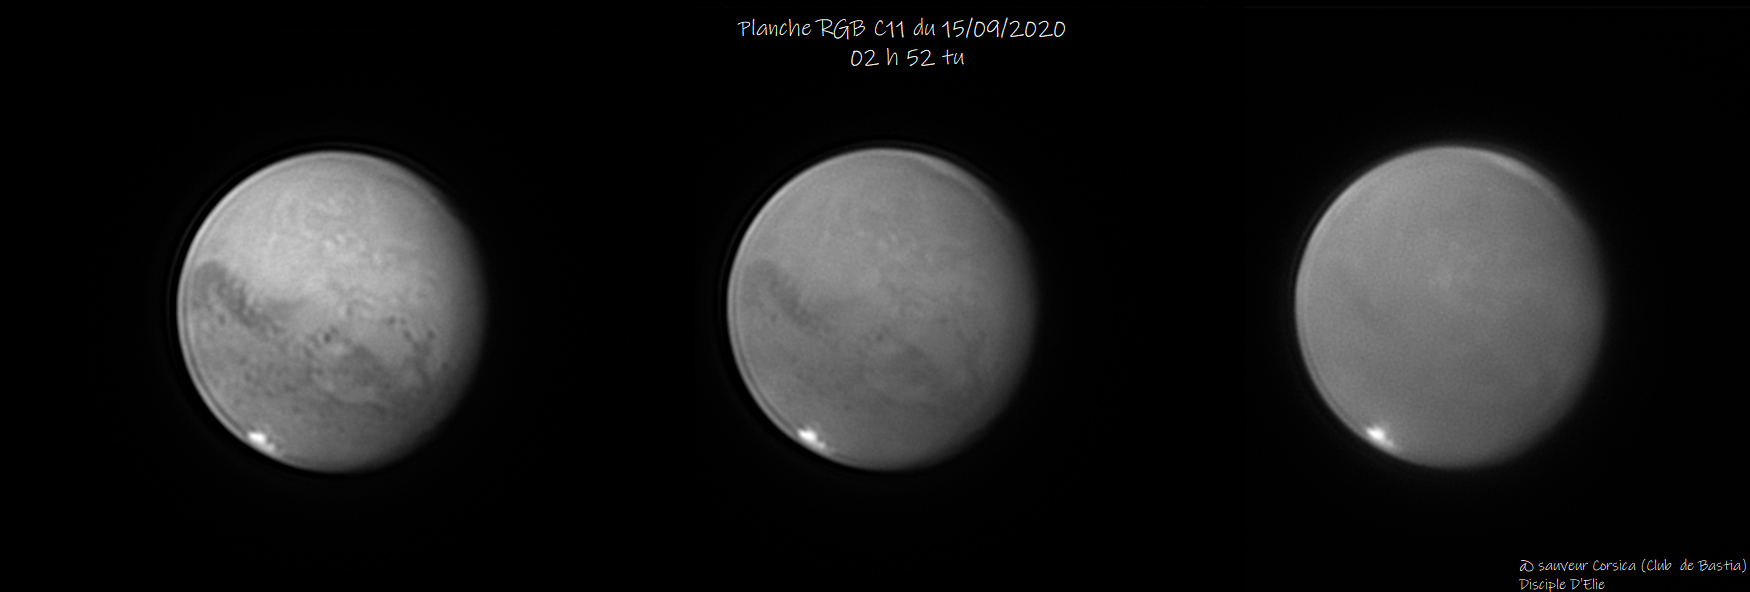 2020-09-15-0252_5-S-RGB_l5_ap1.png.f5b6013ad1eb3e60666d3c97f493d9eb.png